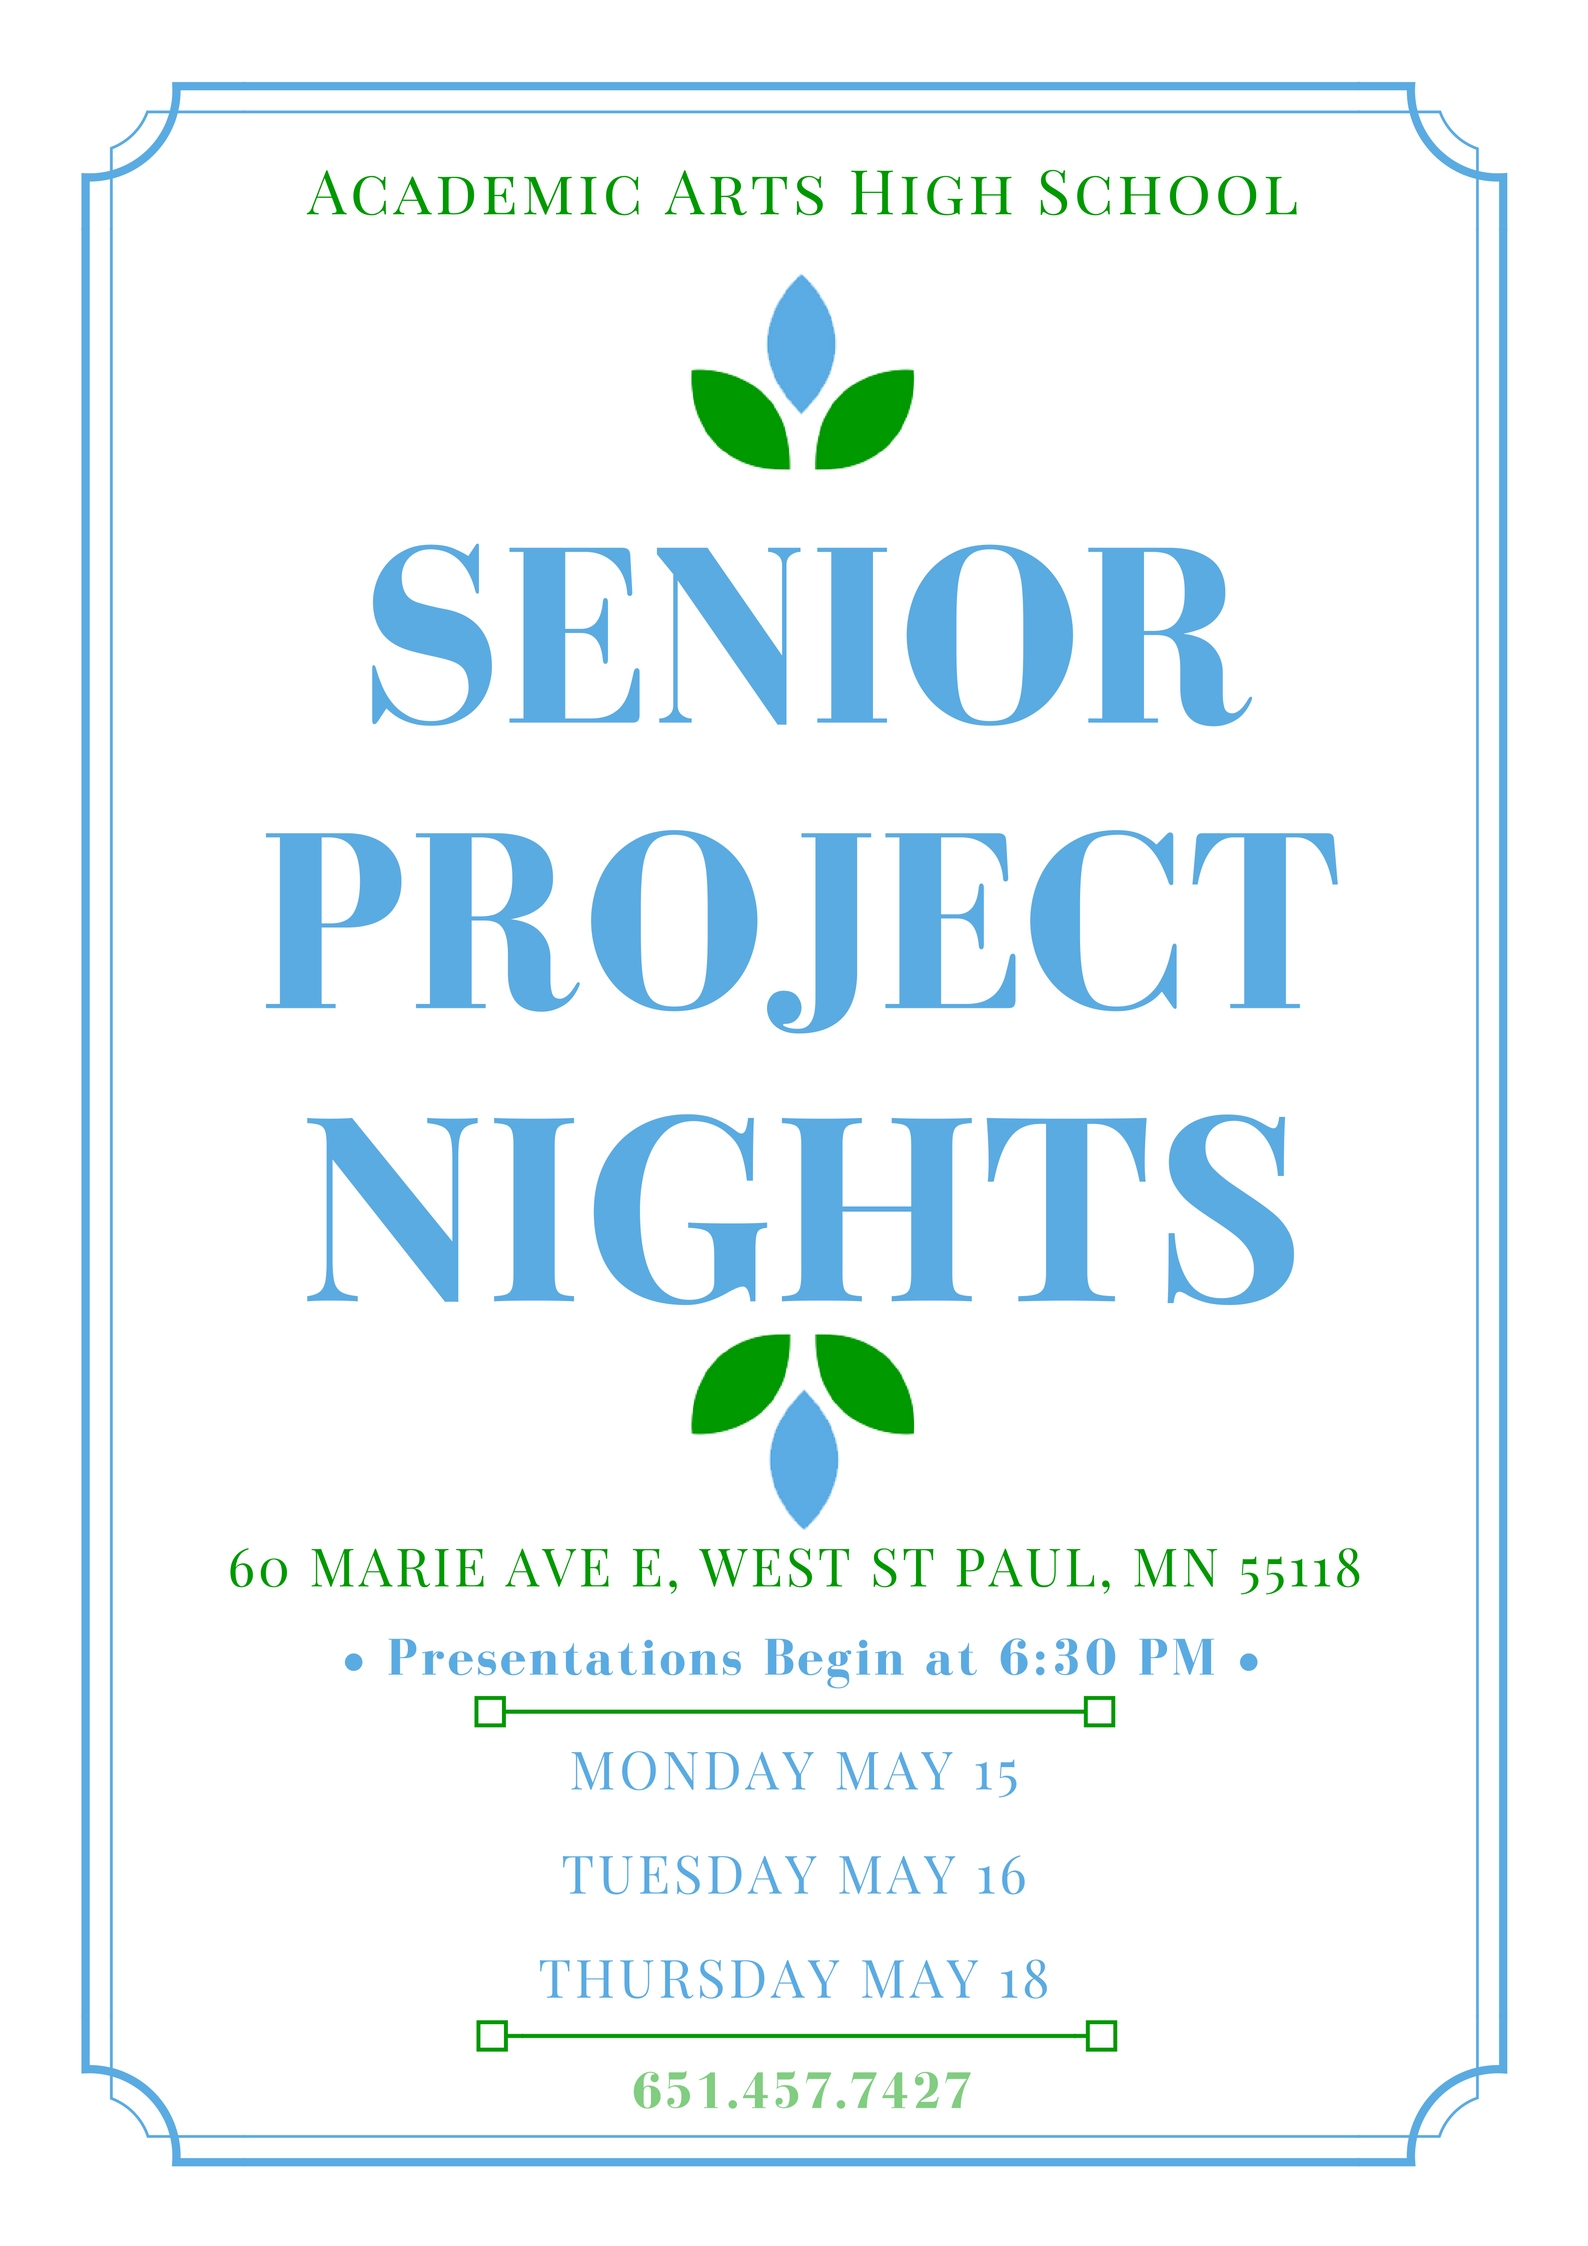 - Senior Presentation Nights Monday, May 15th 6:30-9:00pmTuesday, May 16th 6:30-8:30pmThursday, May 18th 6:30-8:30pm